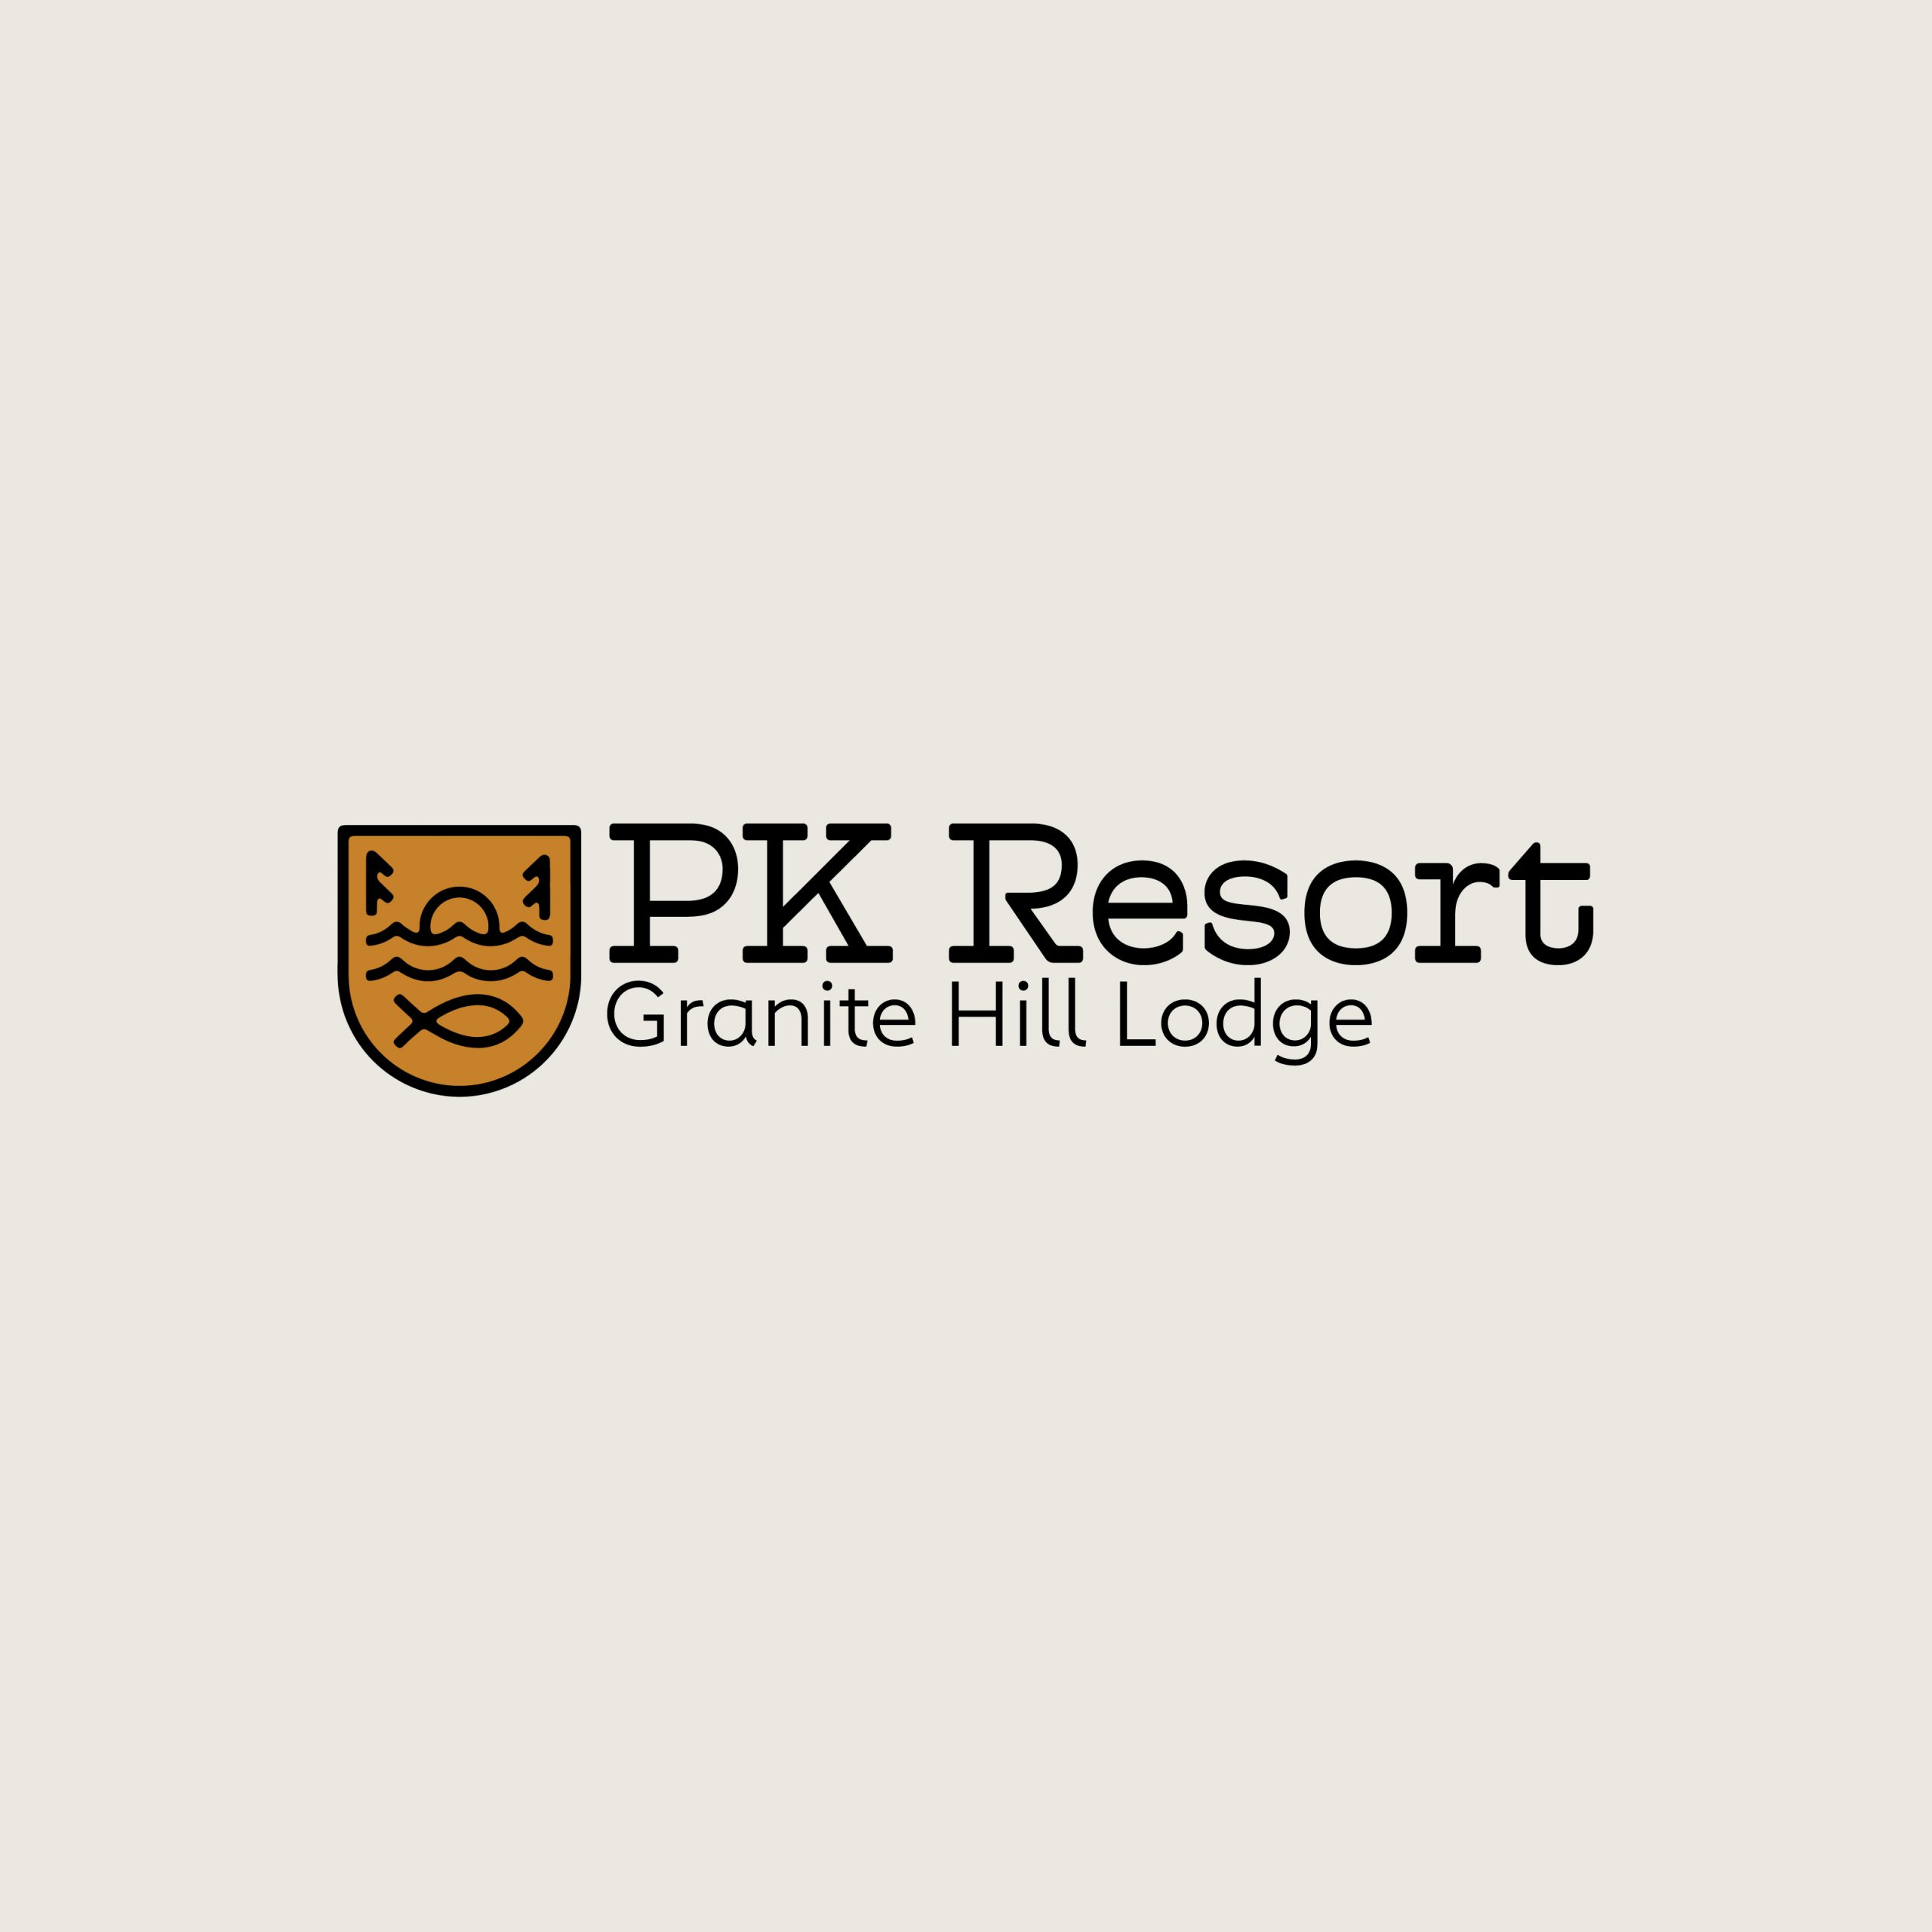 PK_resort_logo_stellen_design